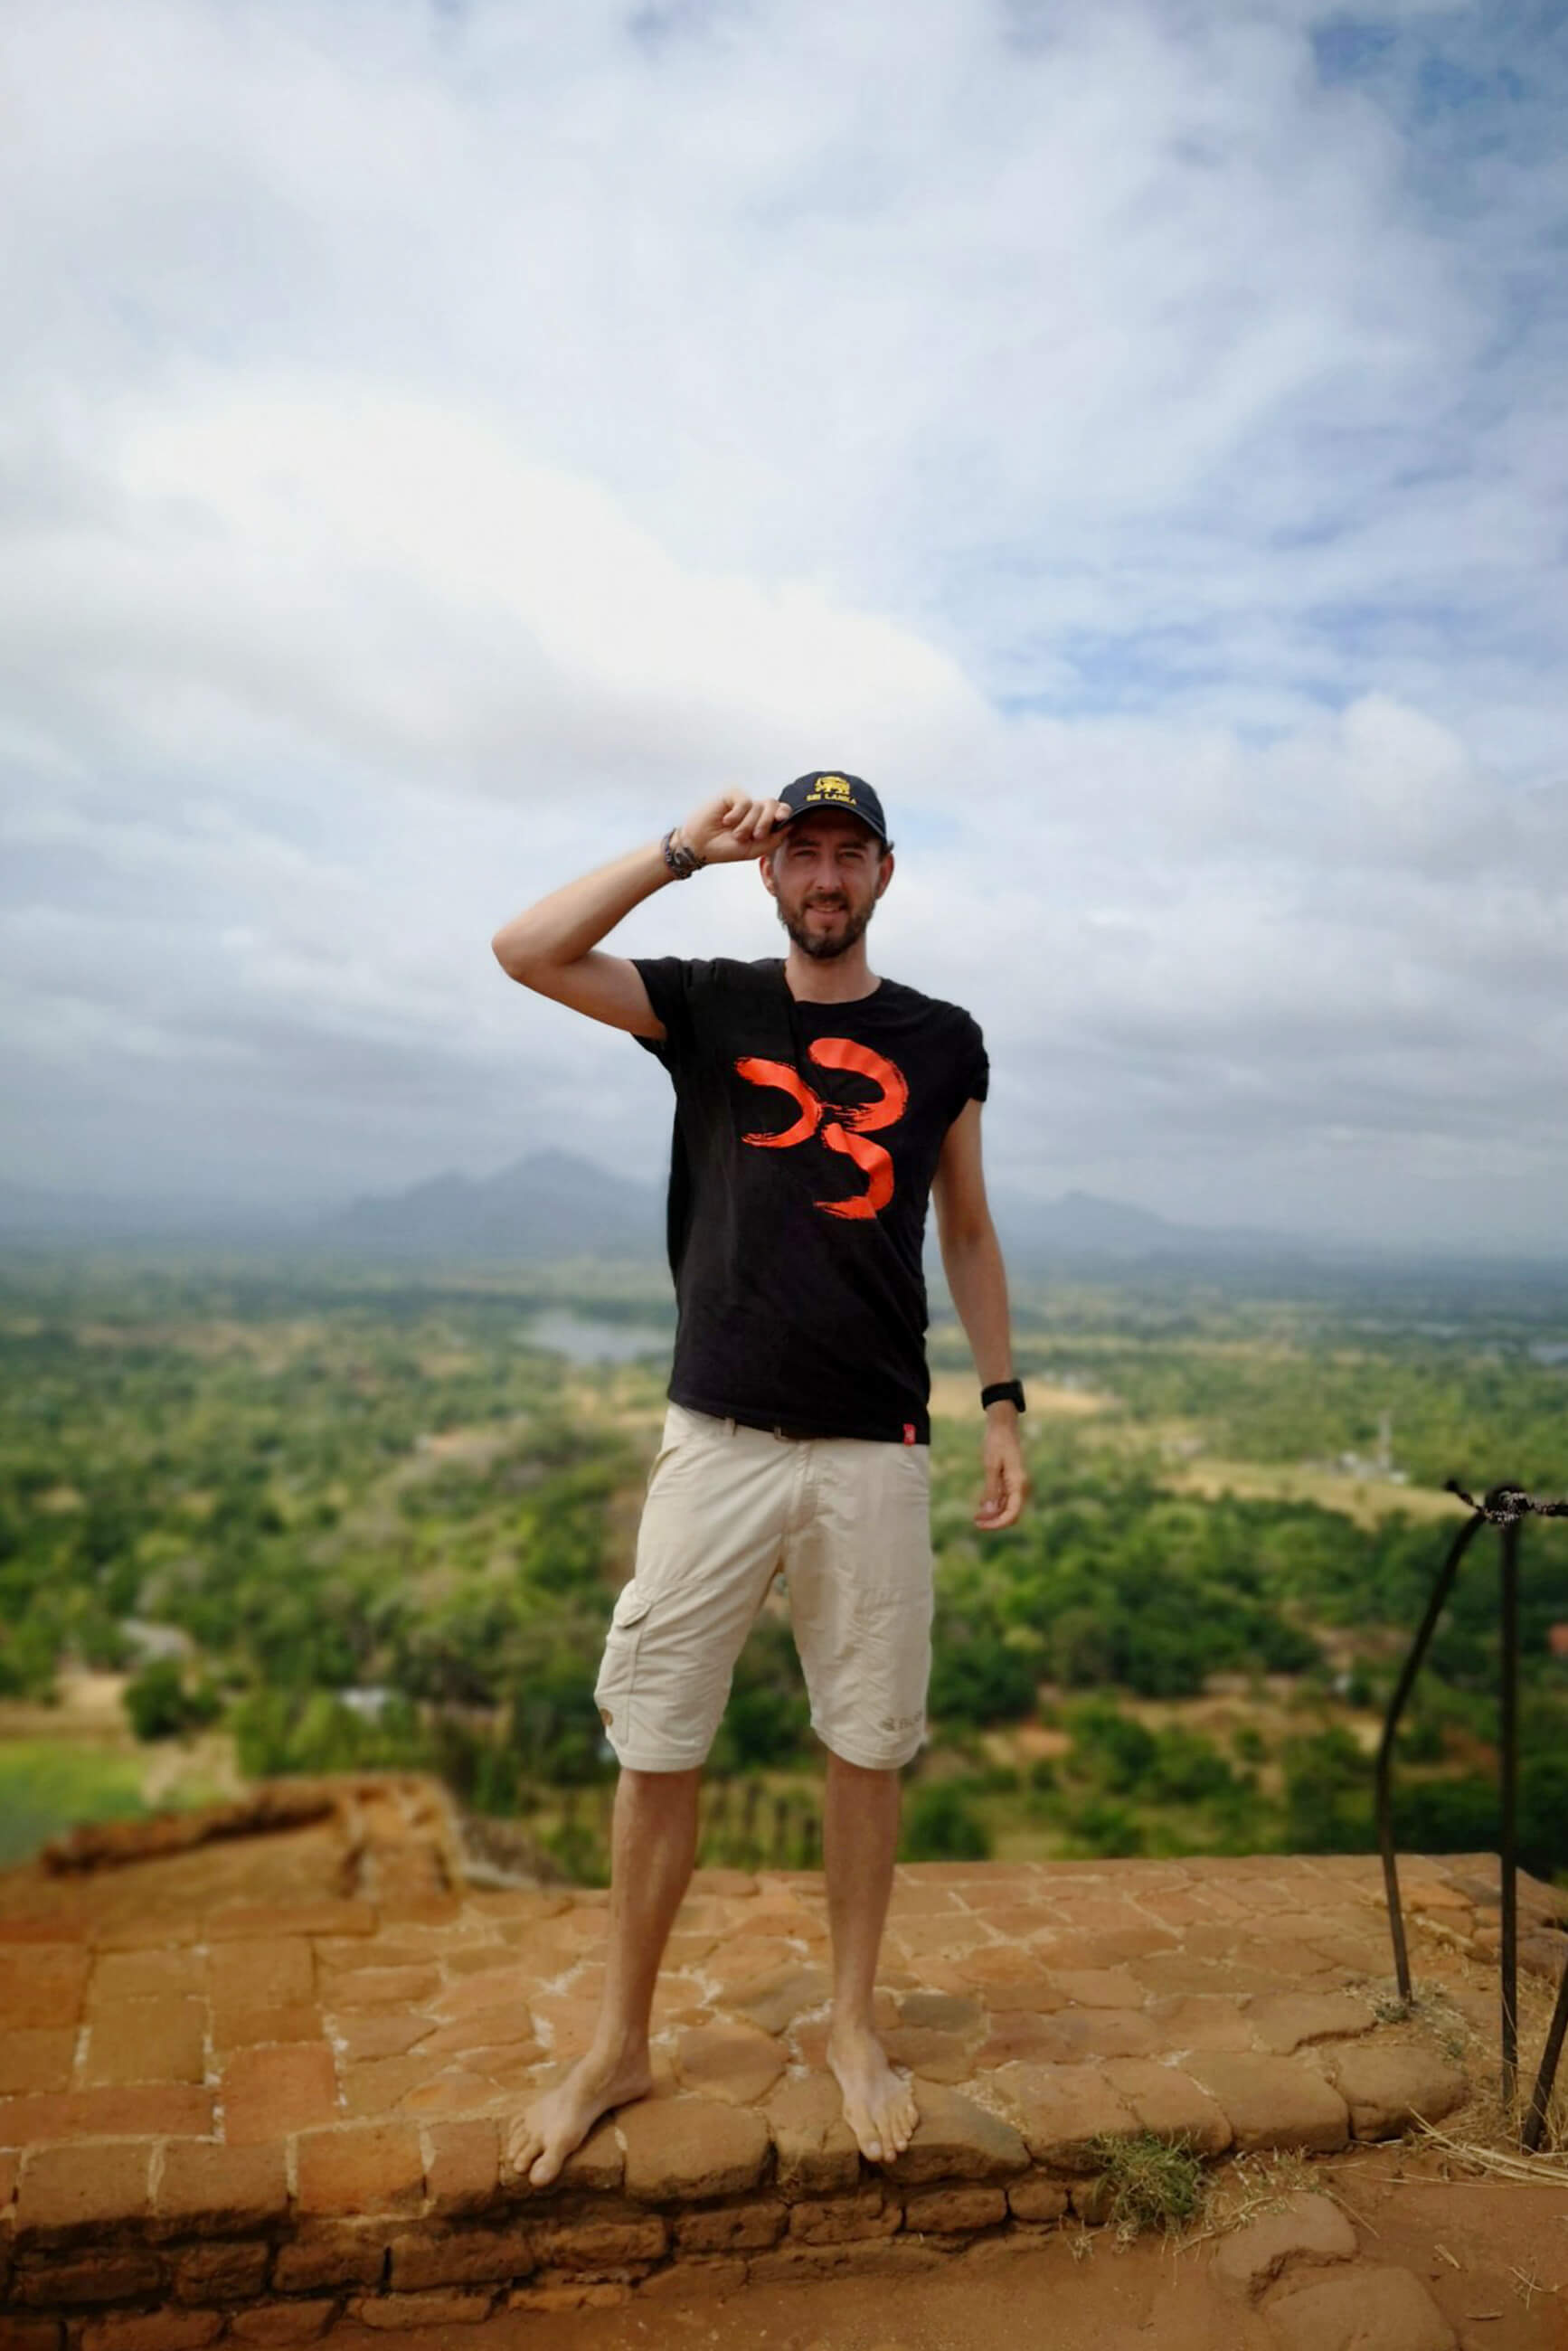 https://bubo.sk/uploads/galleries/5058/janzachar_srilanka.jpg